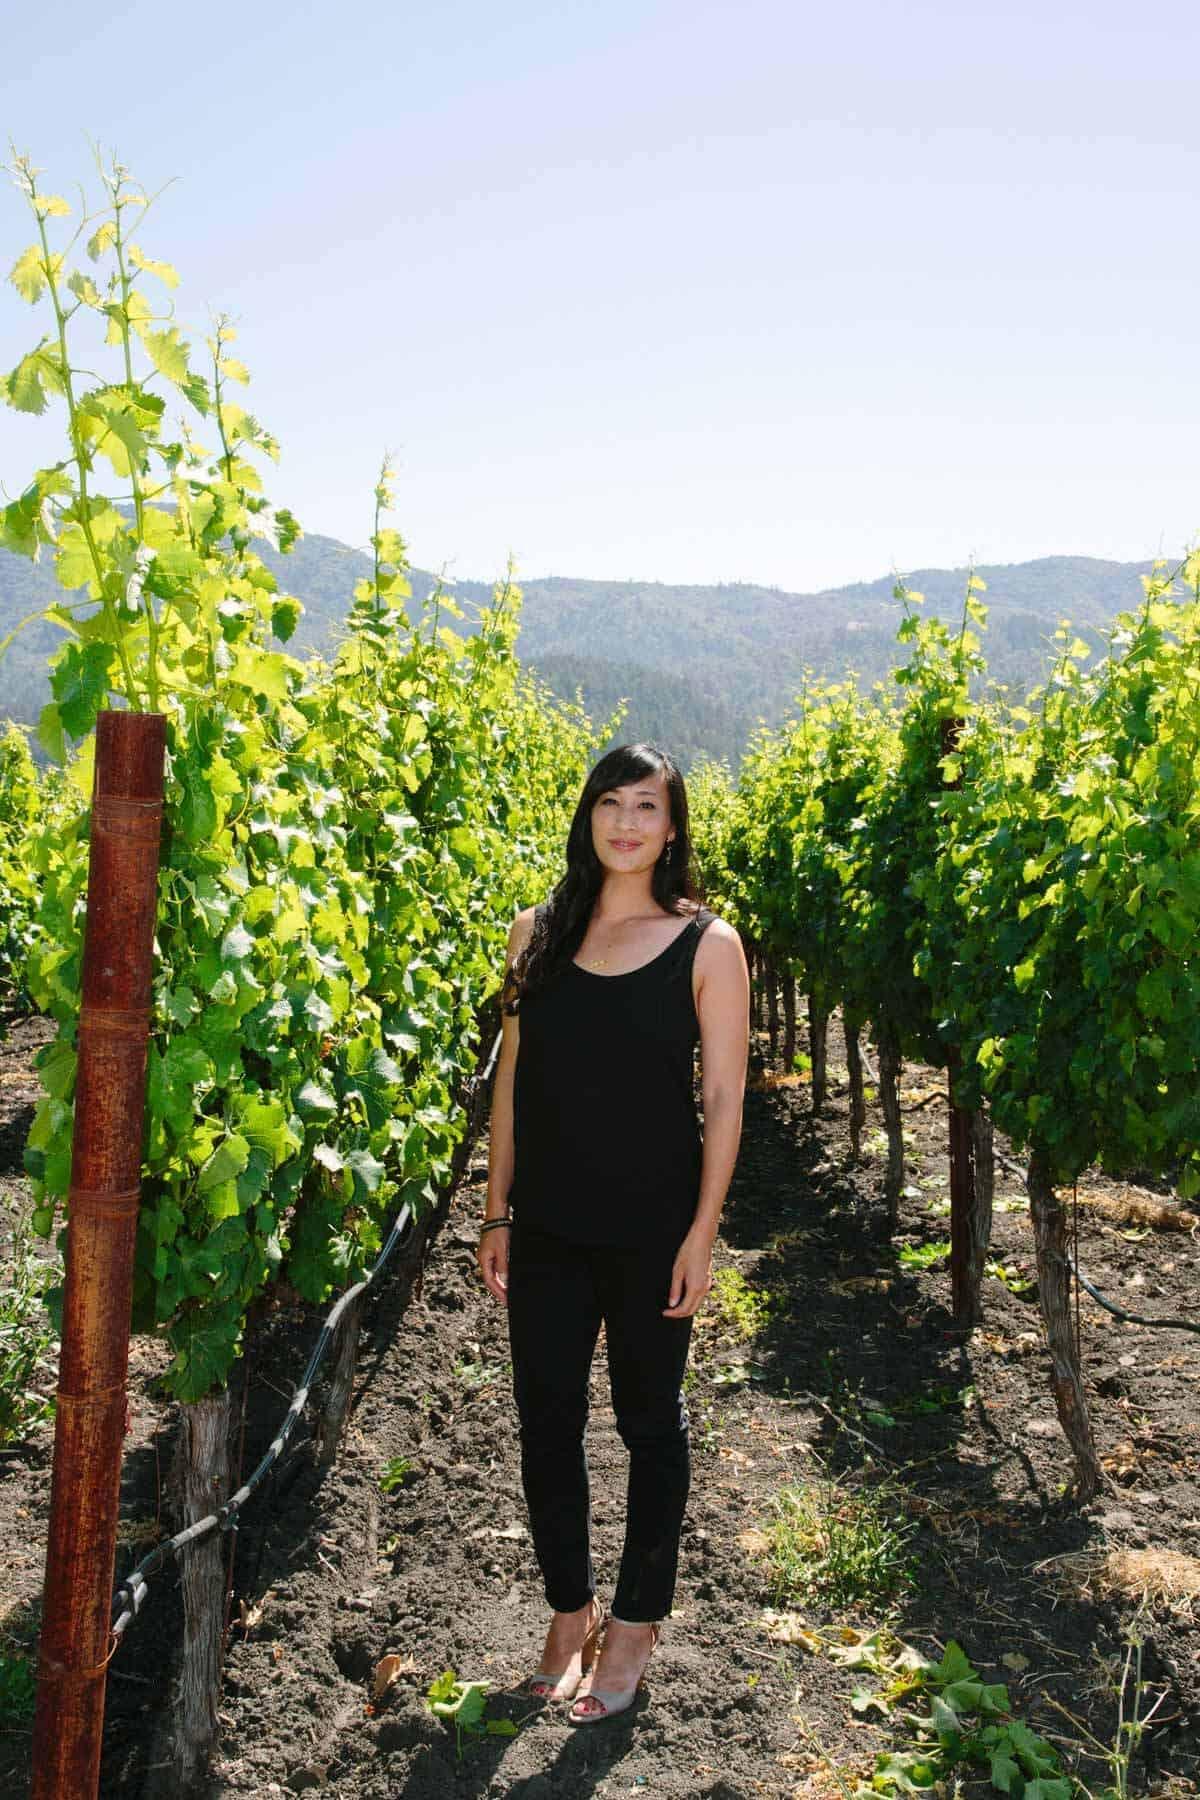 jessica in the vineyard